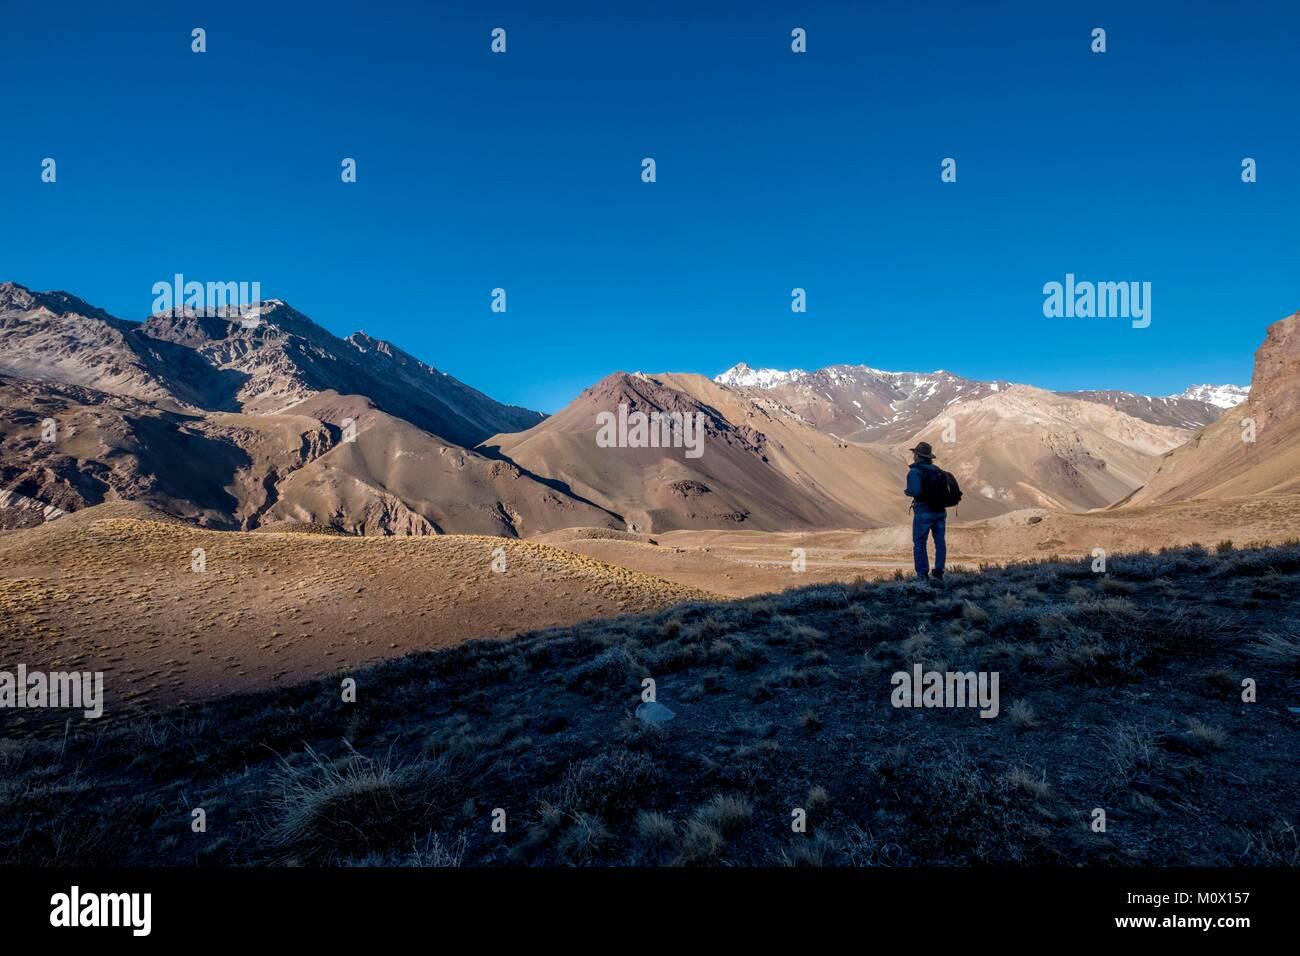 Argentina,Mendoza province,Aconcagua Provincial Park - Stock Image